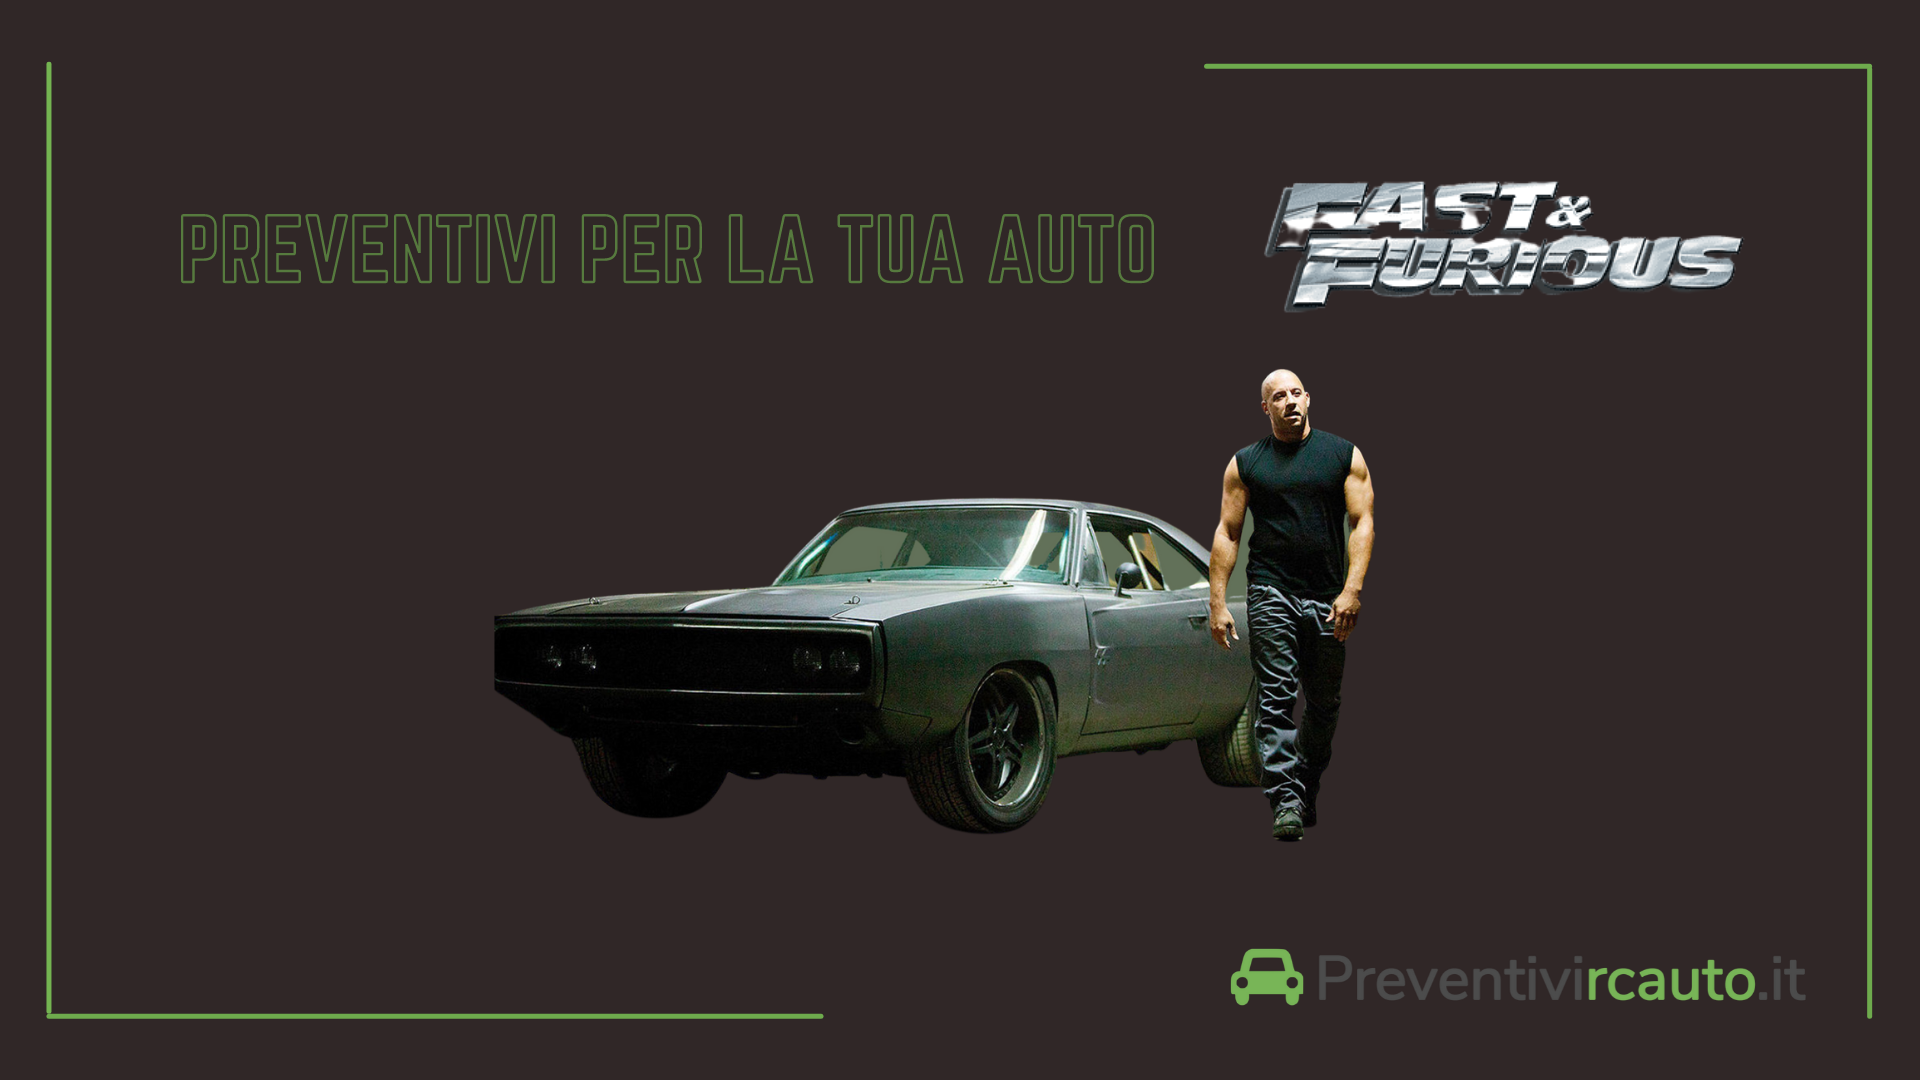 preventivi auto fast and furious